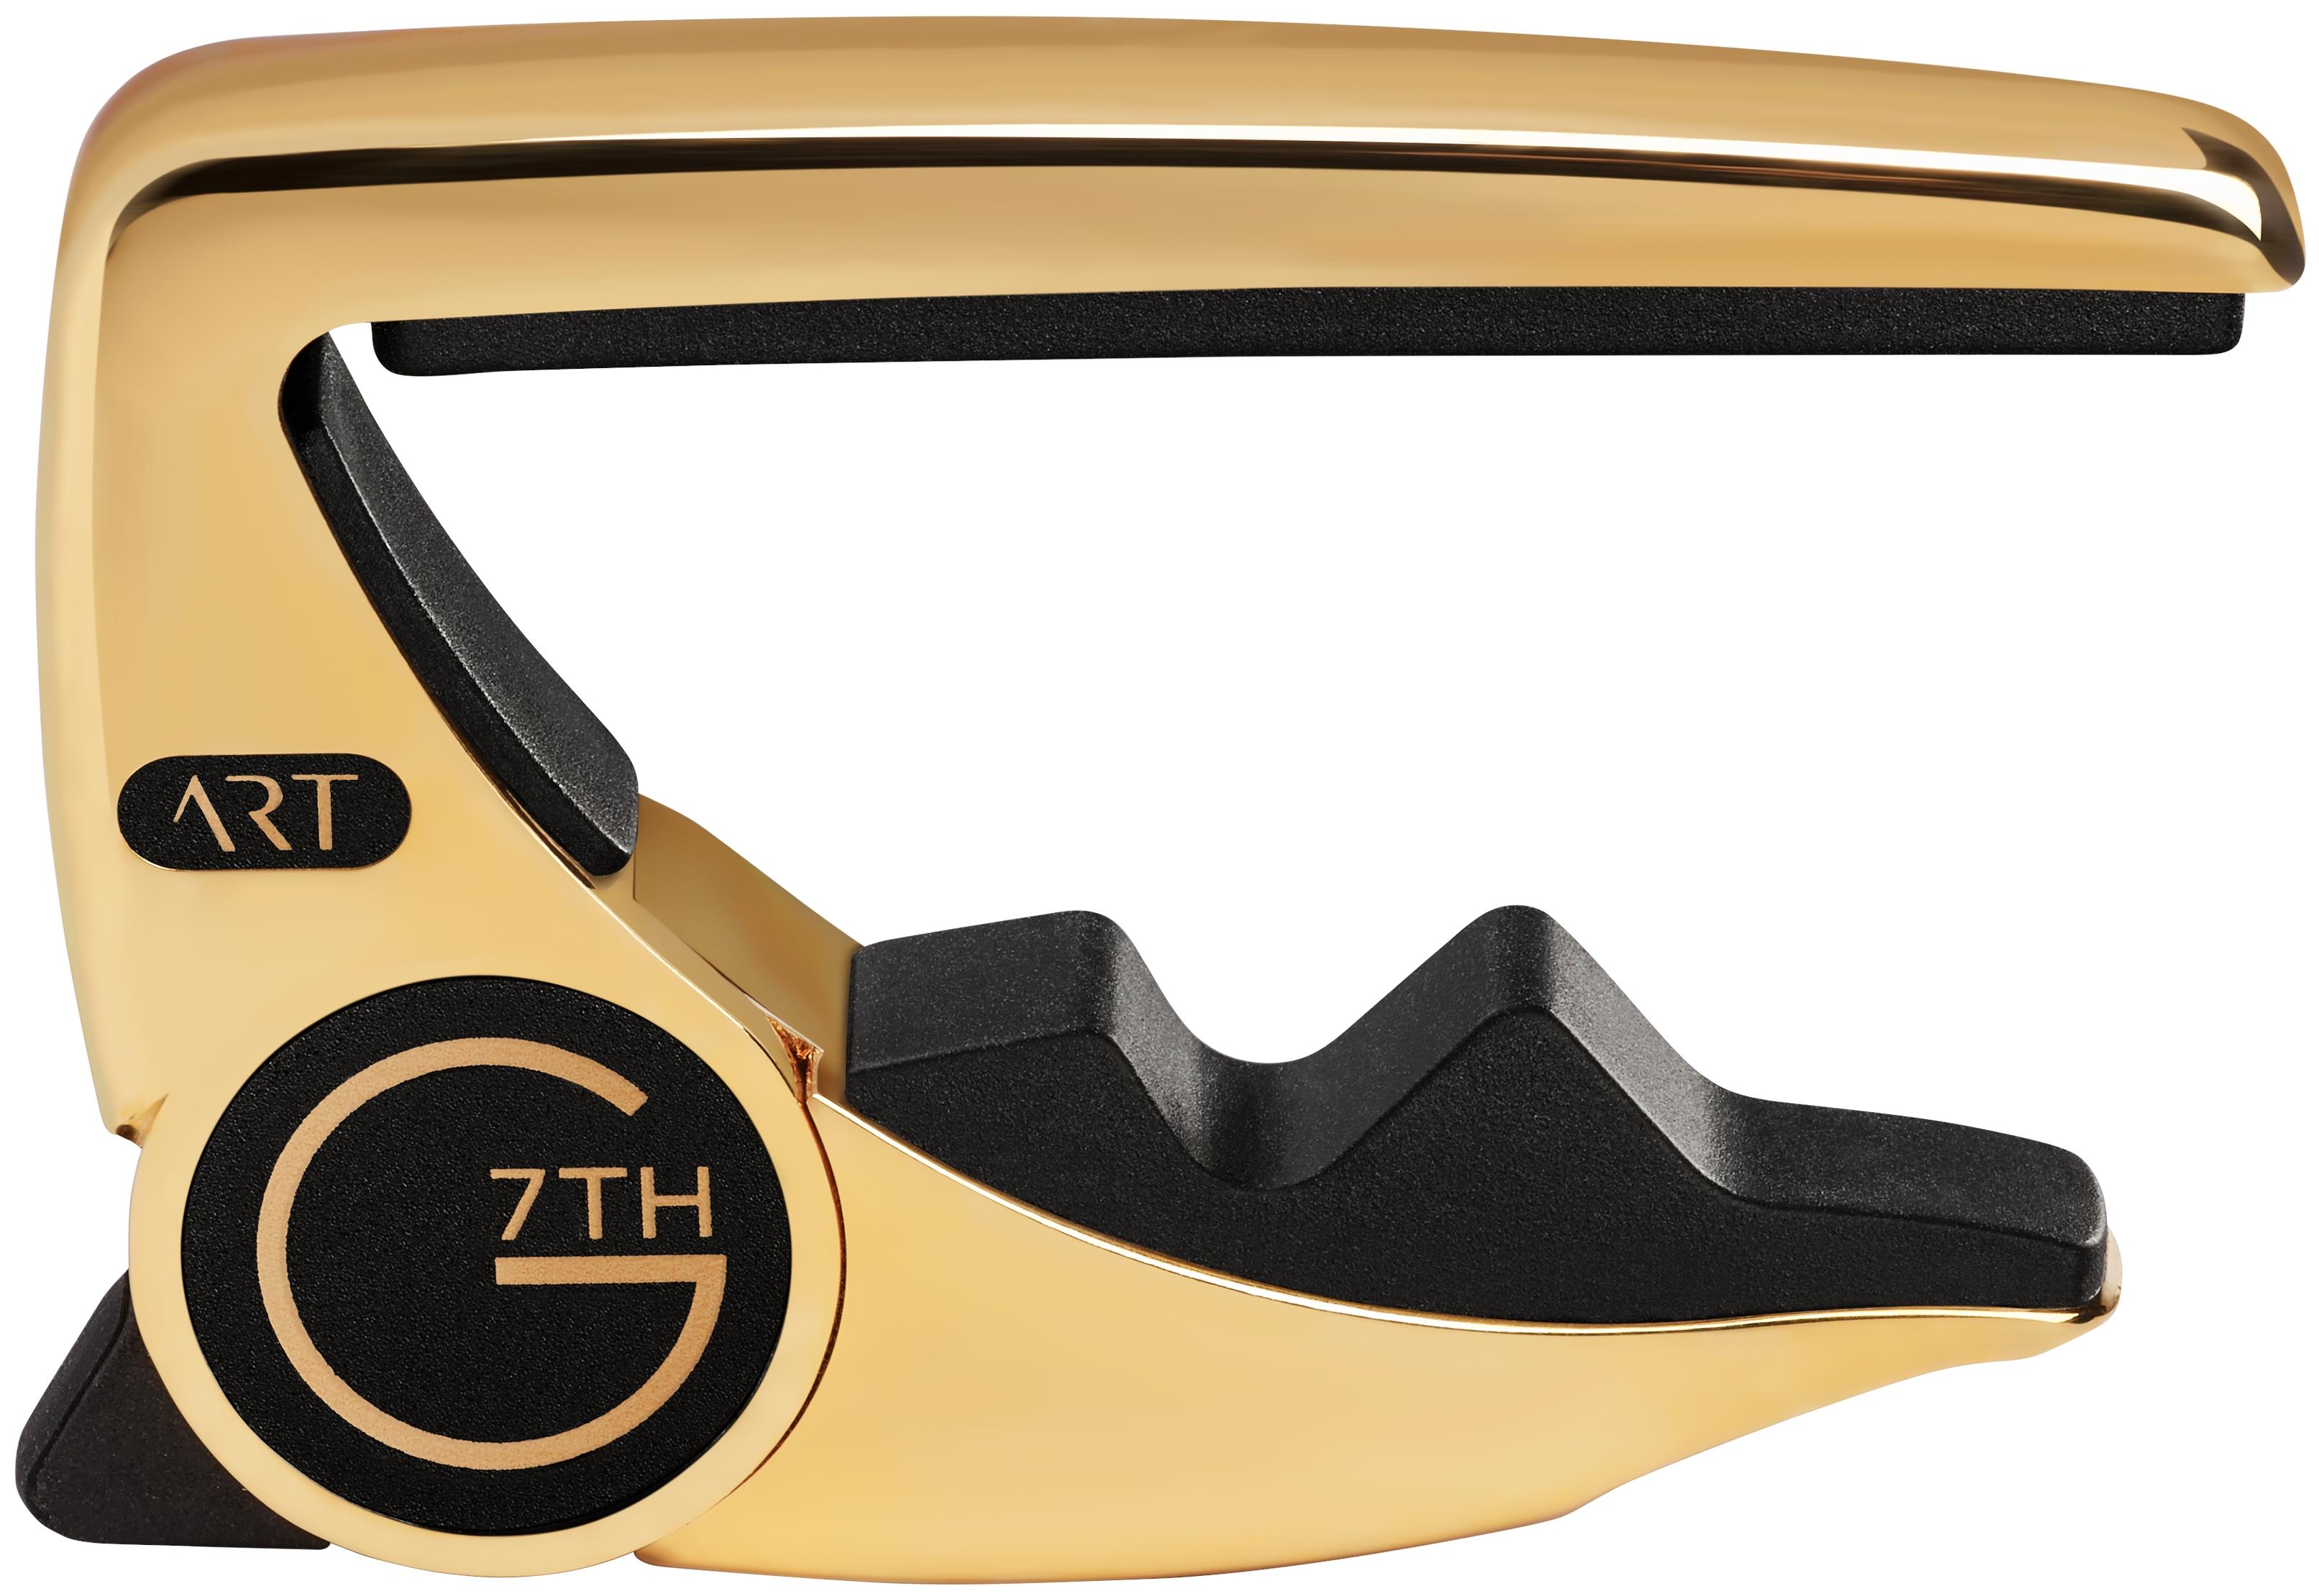 G7TH Performance 3 6-String Gold